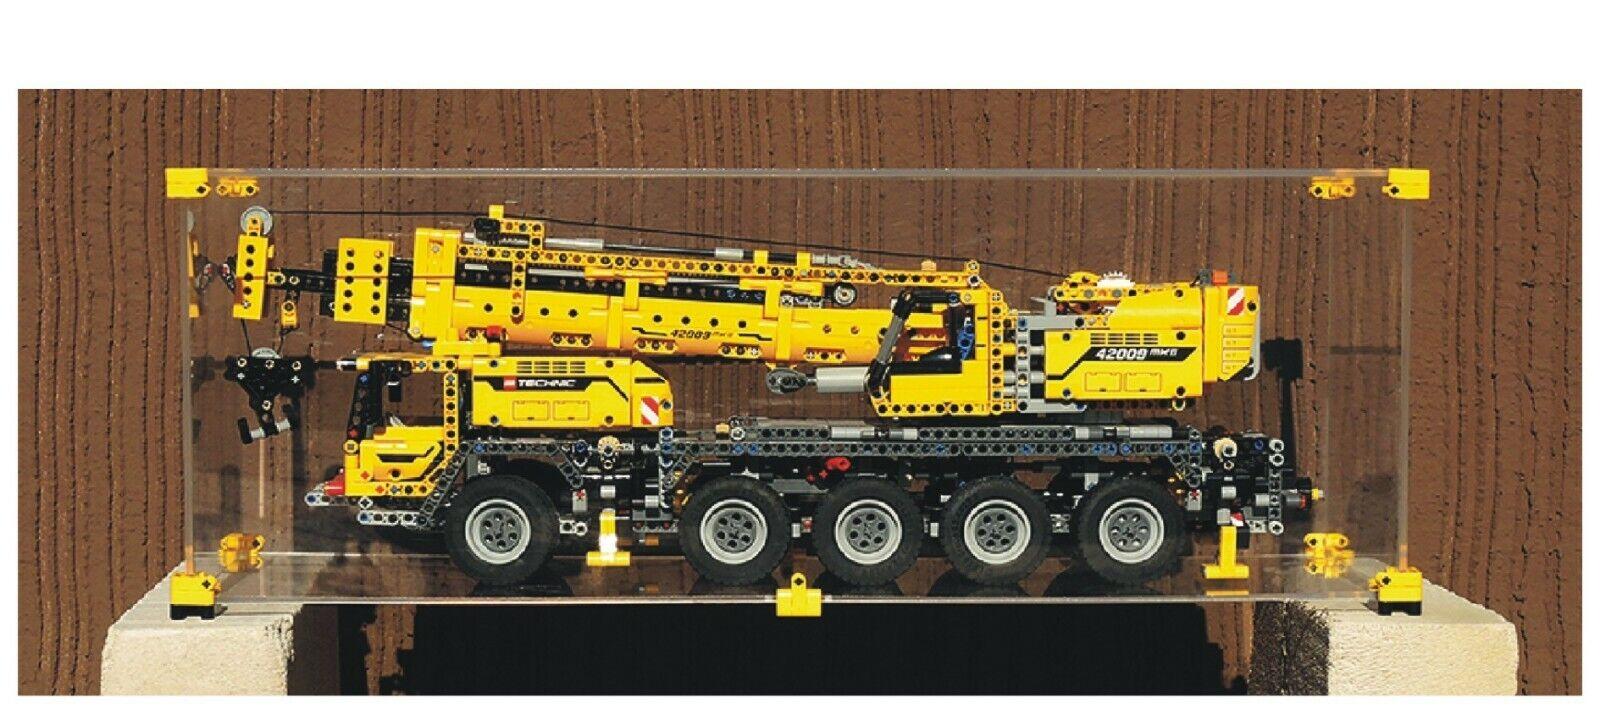 OLEGABOX 4mm zeigen Fall for Lego 42009 Technic Crane